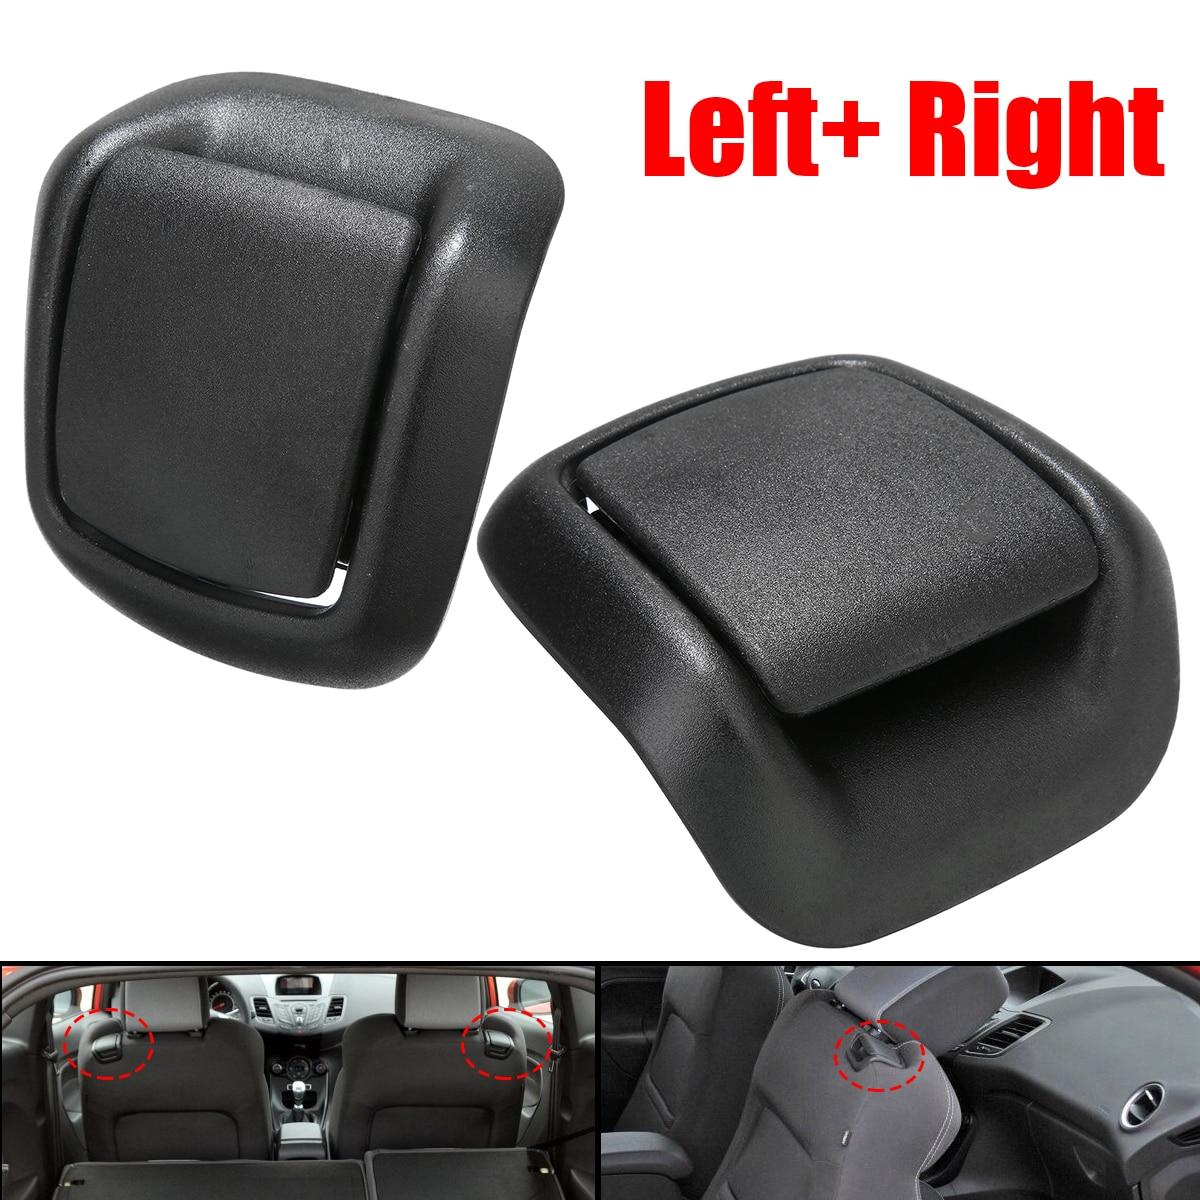 TREYUES 1Pair Front Seat Tilt Handles Auto Interior Parts Plastic For Ford Fiesta MK6 2002-2008 1417520 1417521